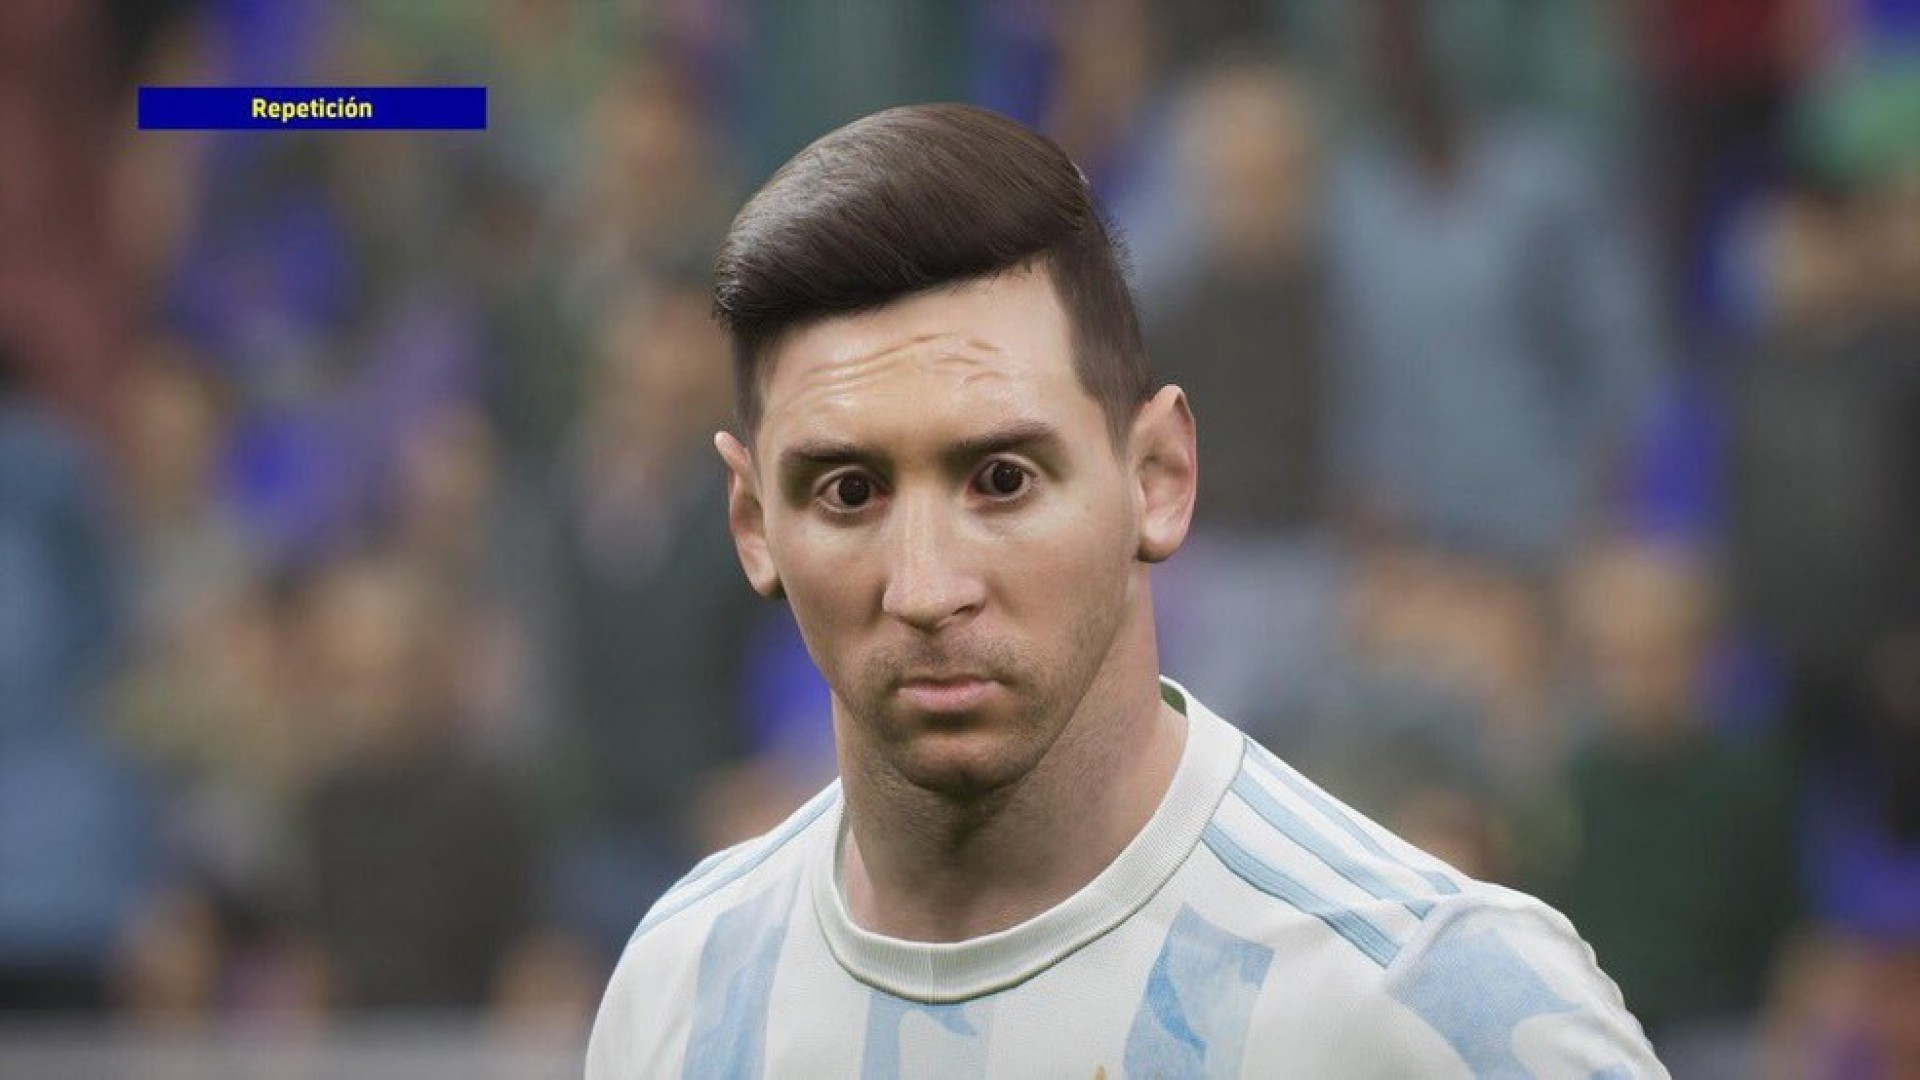 Konami pede desculpas após bugs e avatar de Messi 'Bizarro' viralizarem